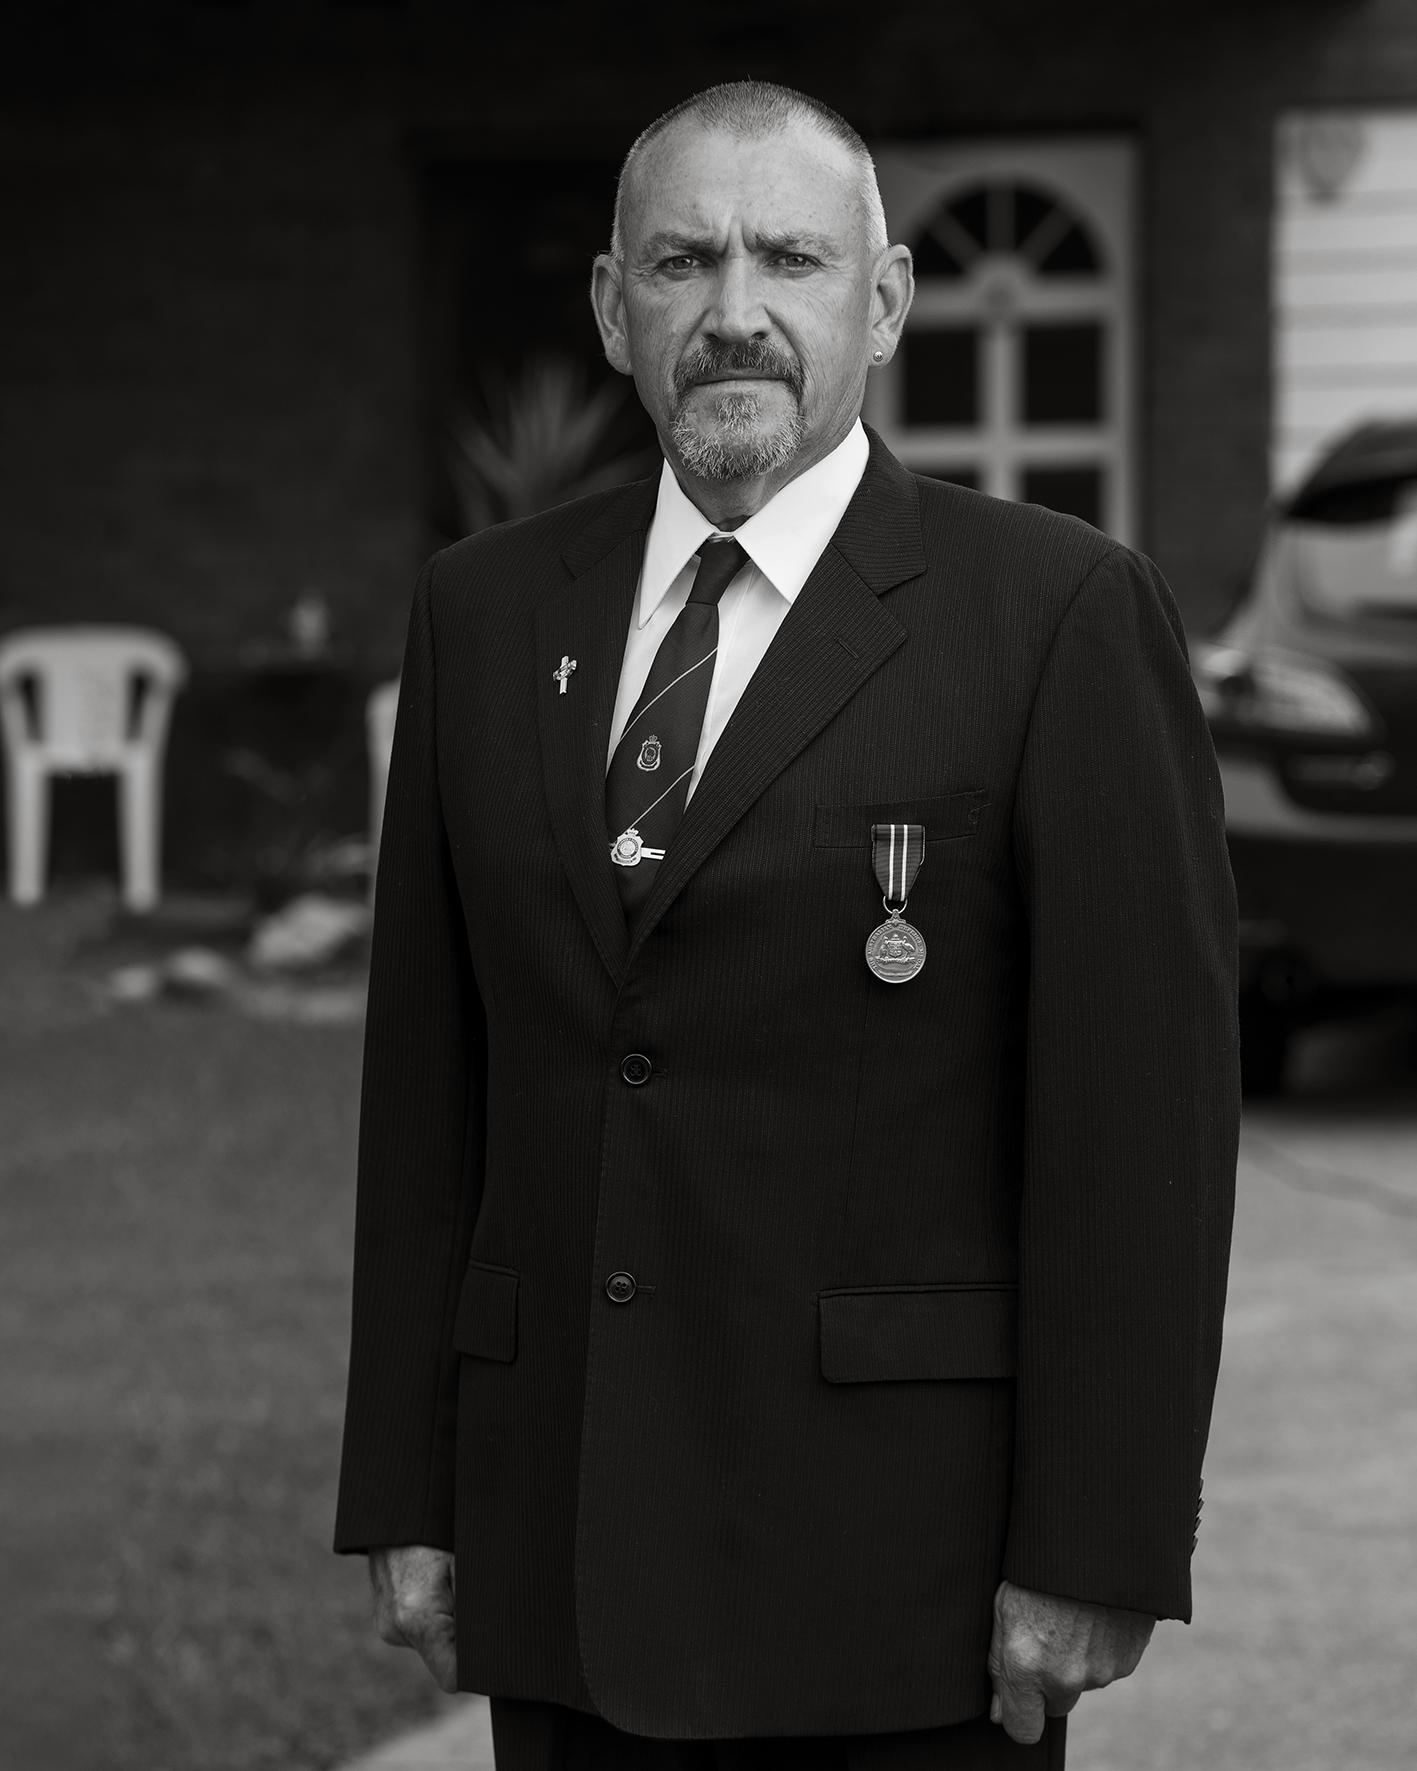 Russell Marsh | 60 | Australian Army